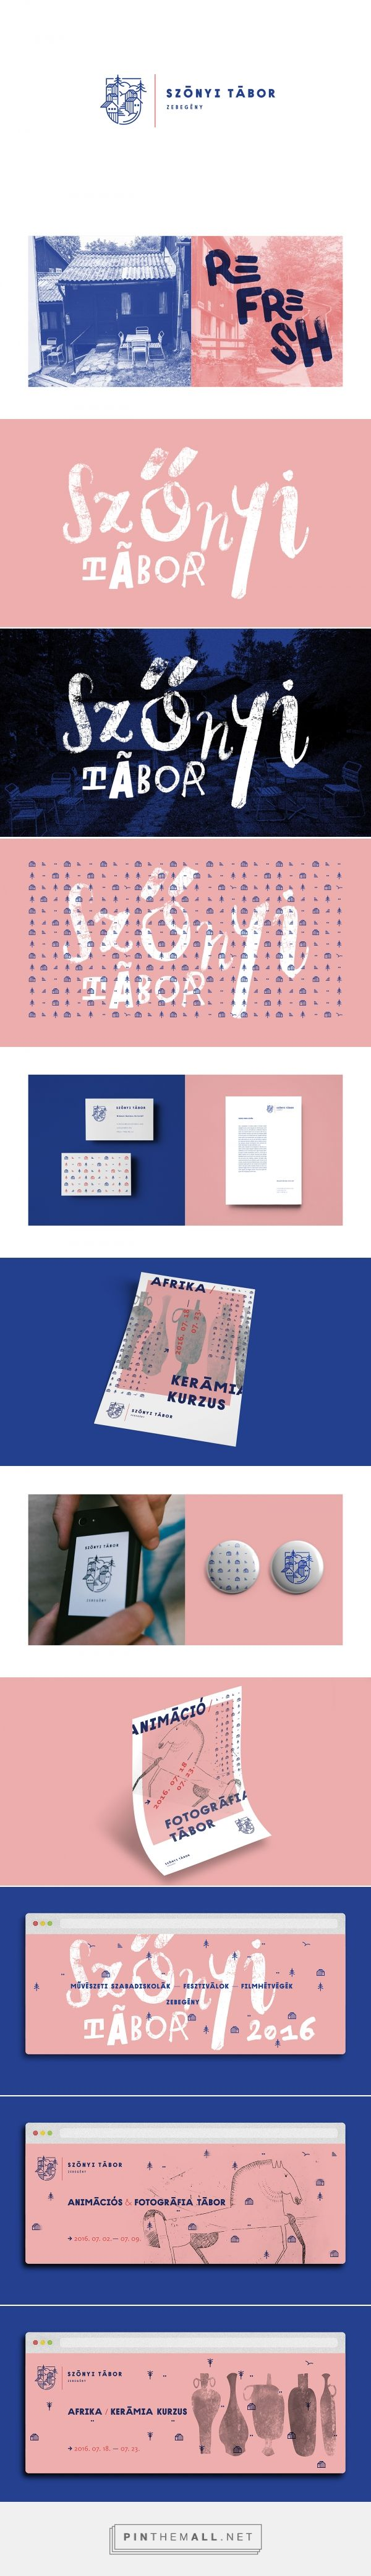 Szonyi Tabor Branding by Hoffmann Tamás Boldizsár on Behance | Fivestar Branding – Design and Branding Agency & Inspiration Gallery